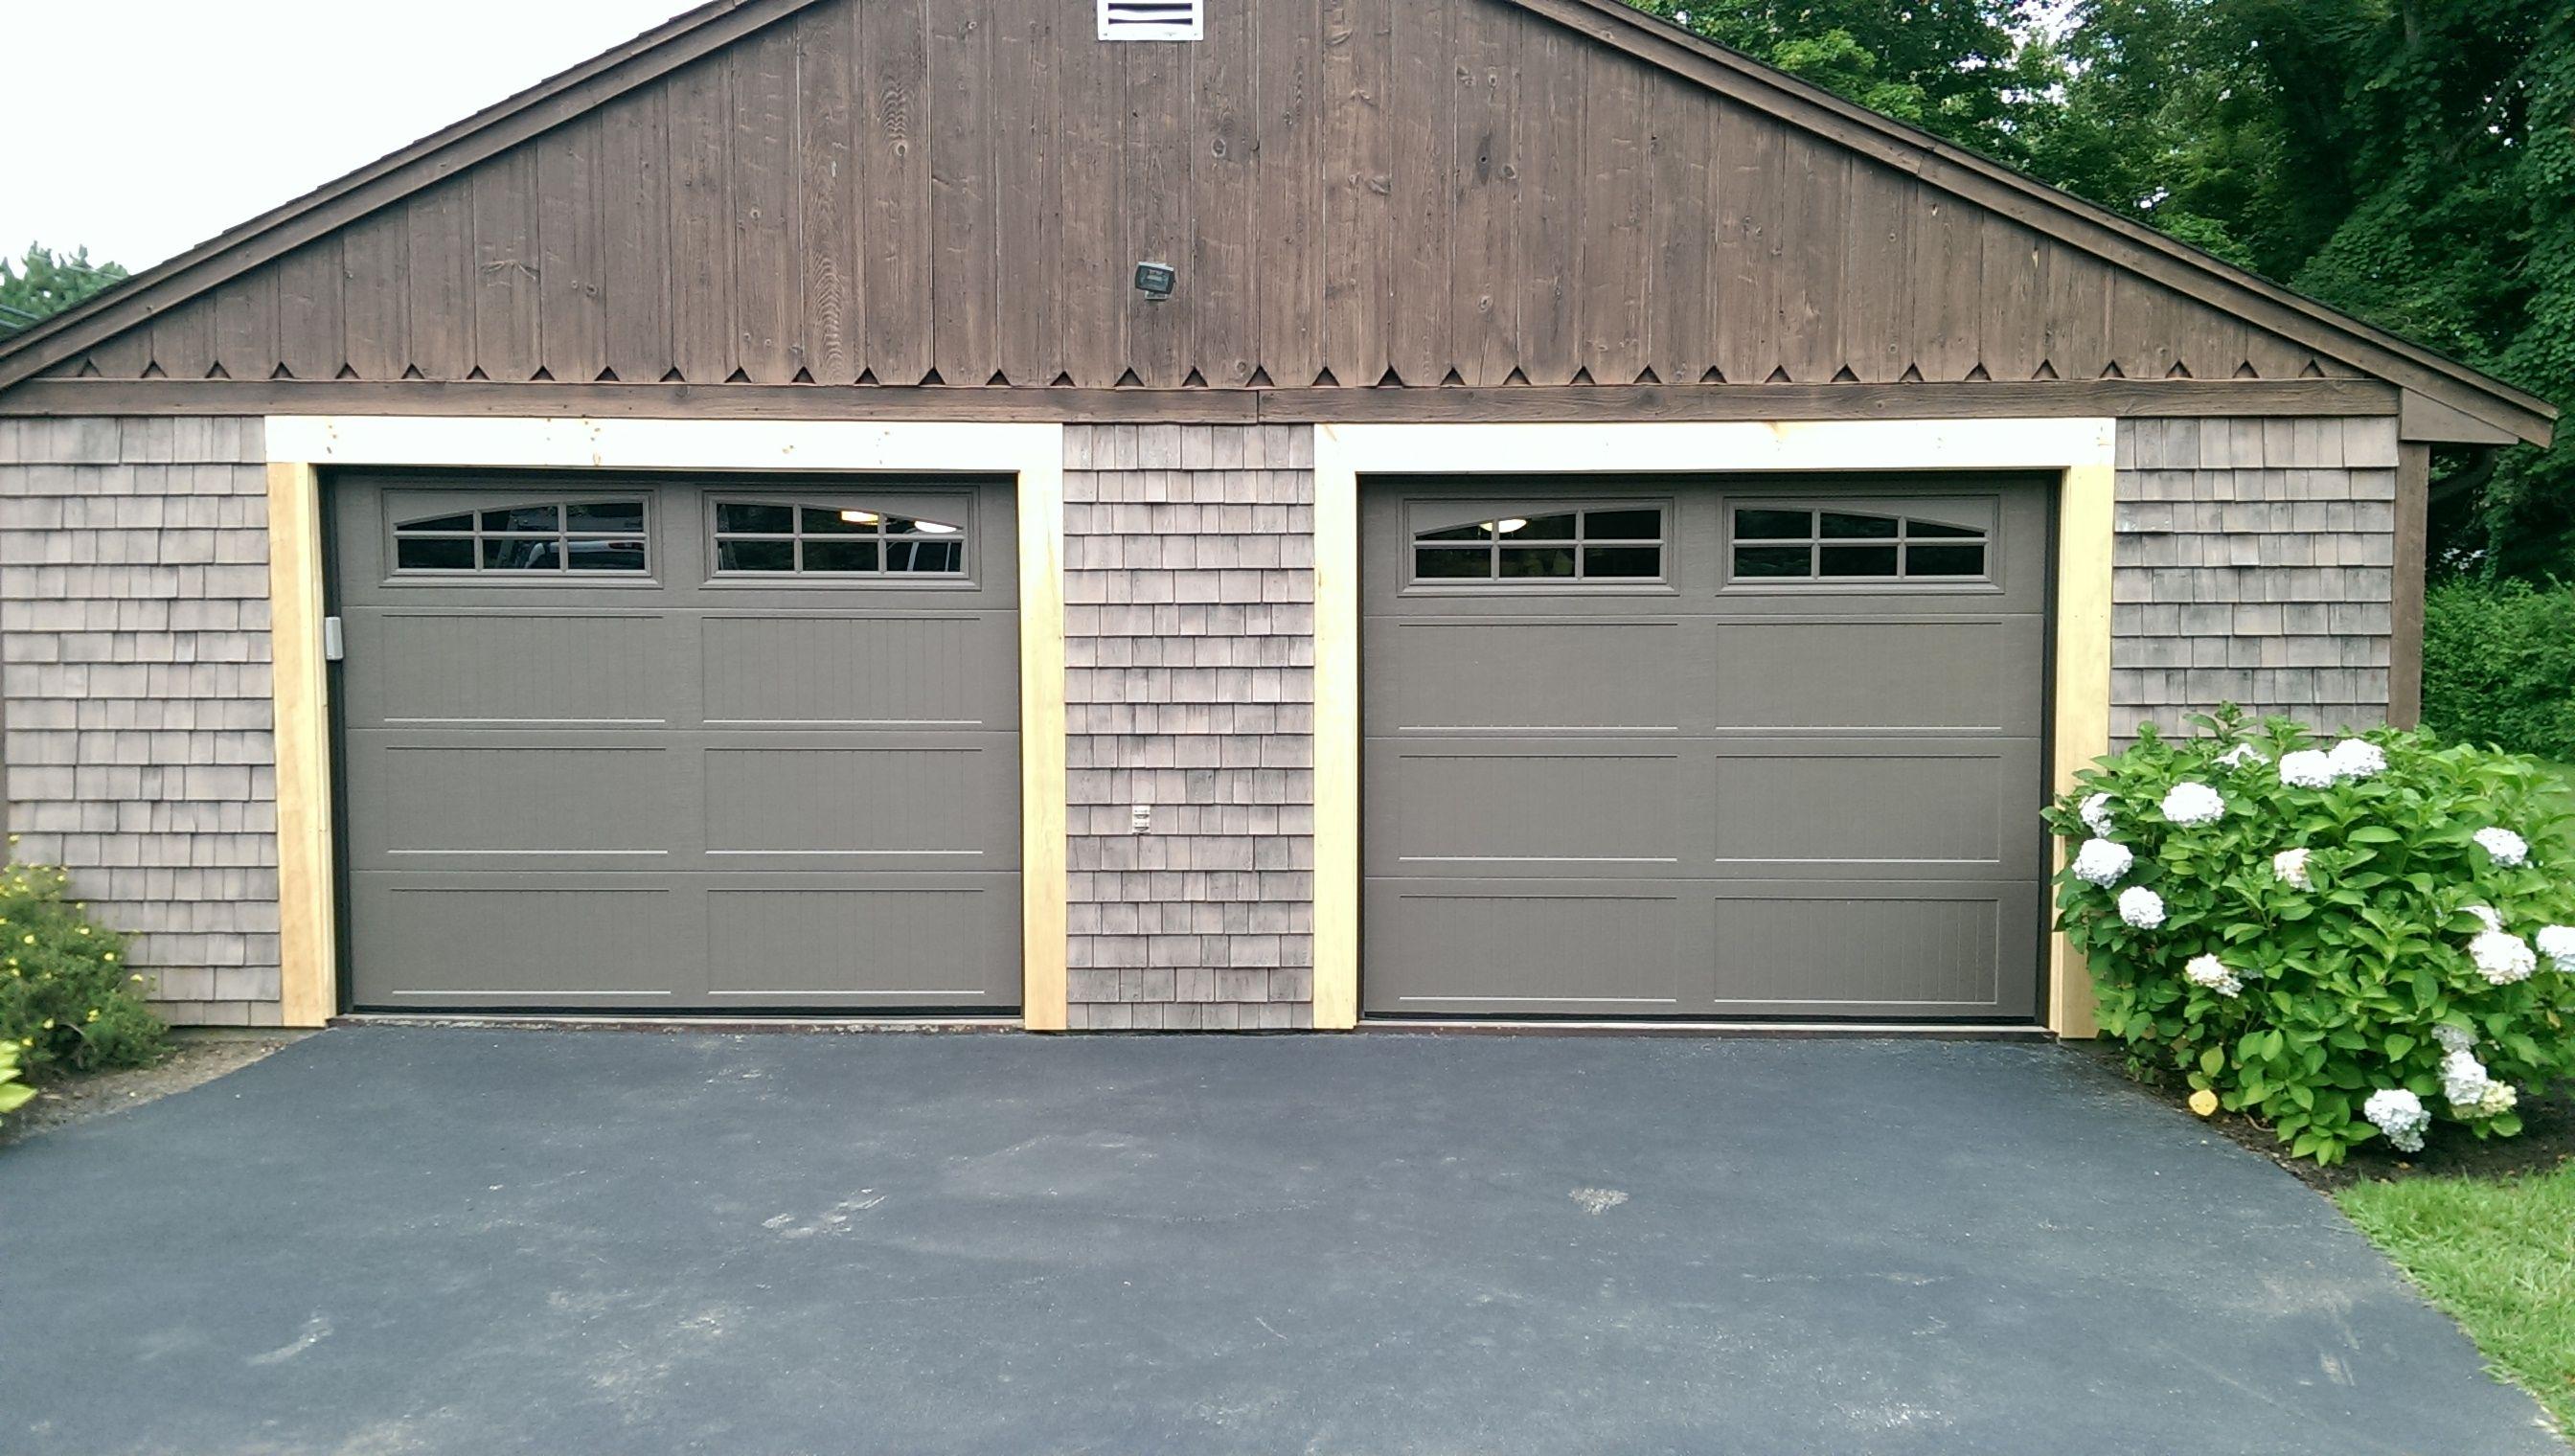 Glass overhead doors - Haas Model 664 Long Panel Steel Insulated Carriage House Garage Doors In Bronze With Arch 6